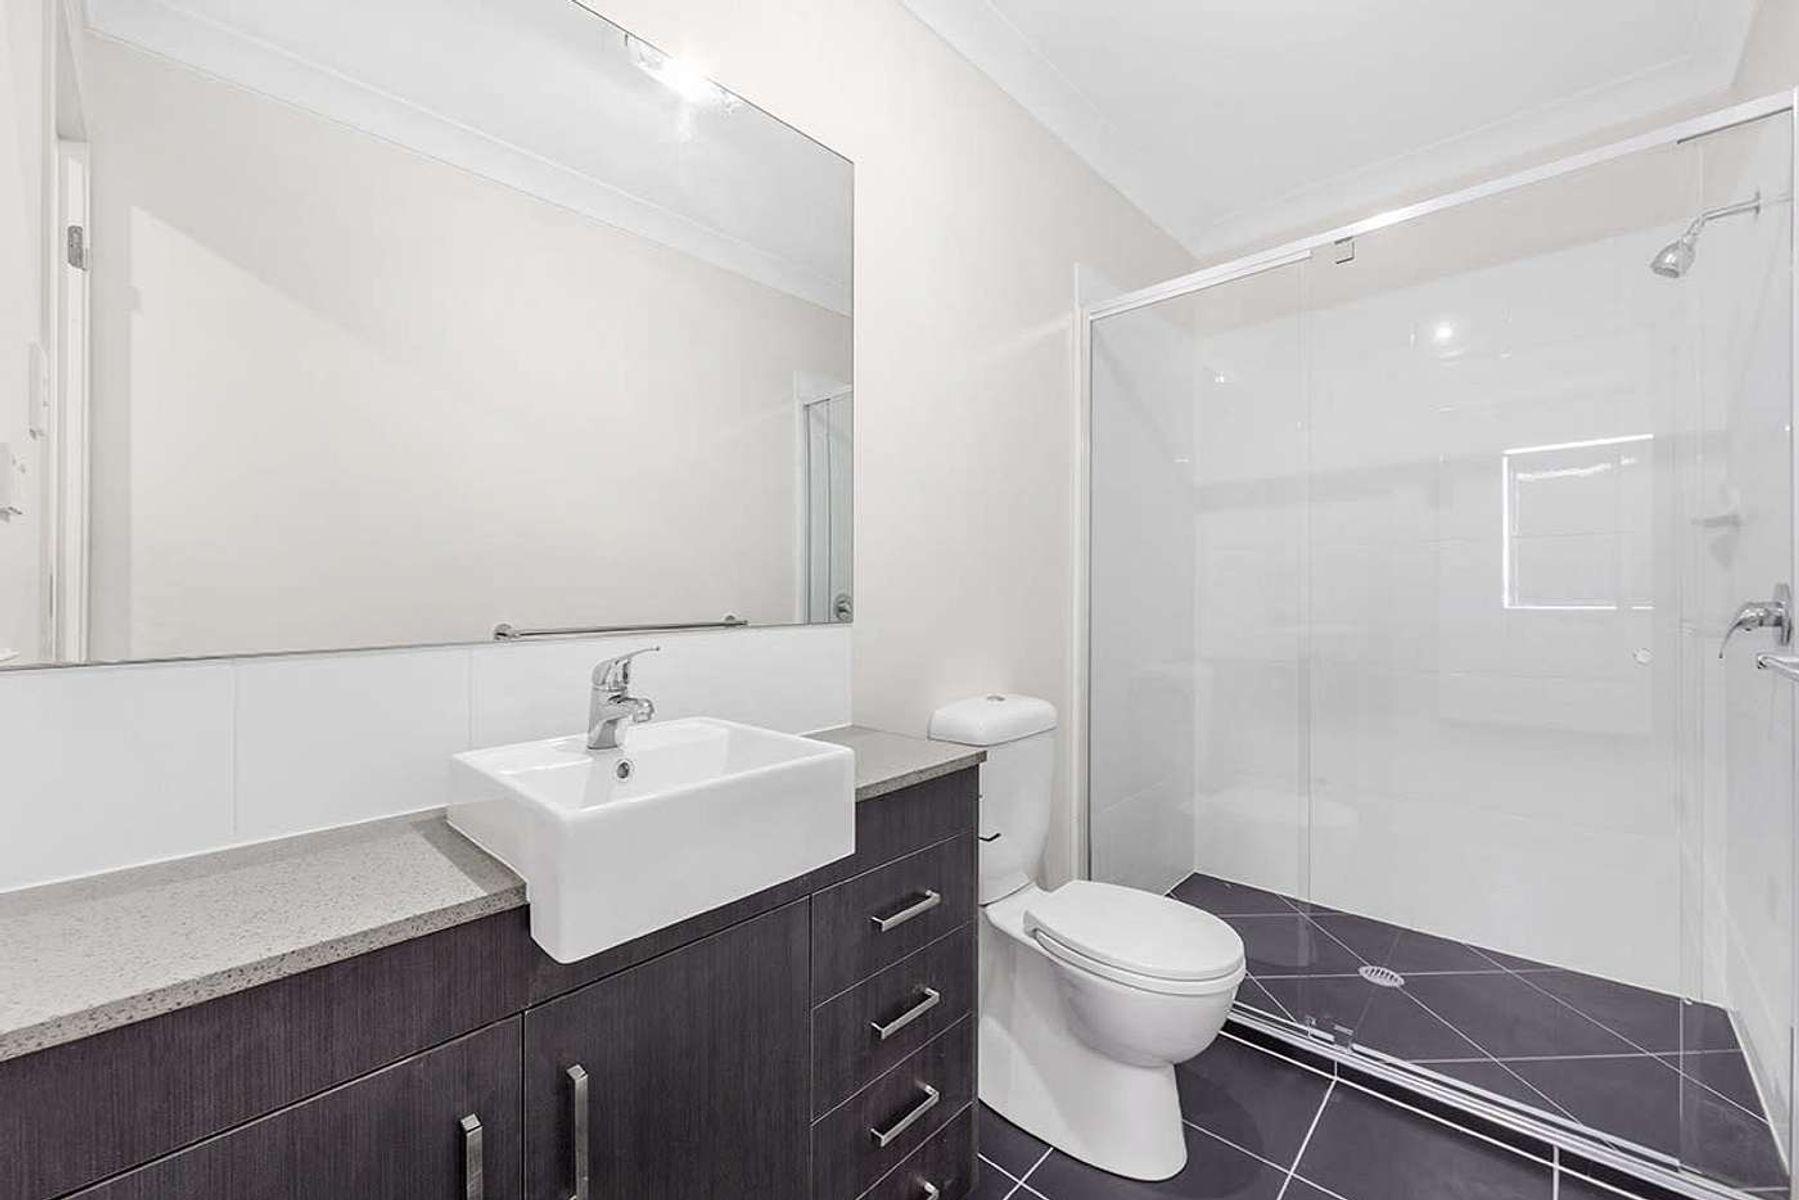 47/54 Littleton Street, Richlands, QLD 4077